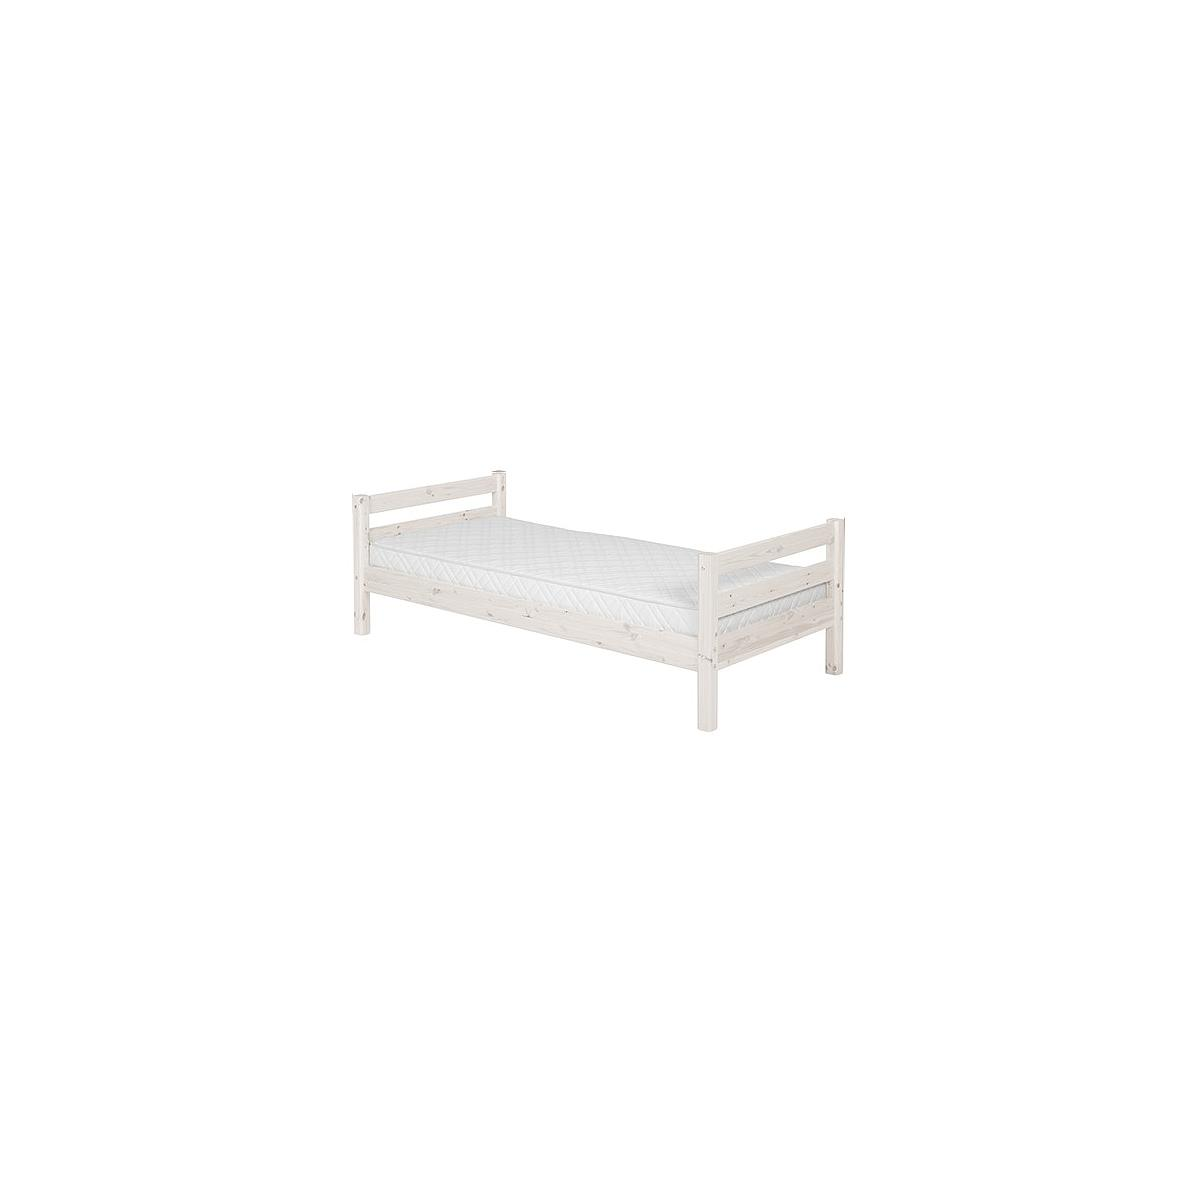 CLASSIC LINE by Flexa Lit de base blanchi 90x190 cm